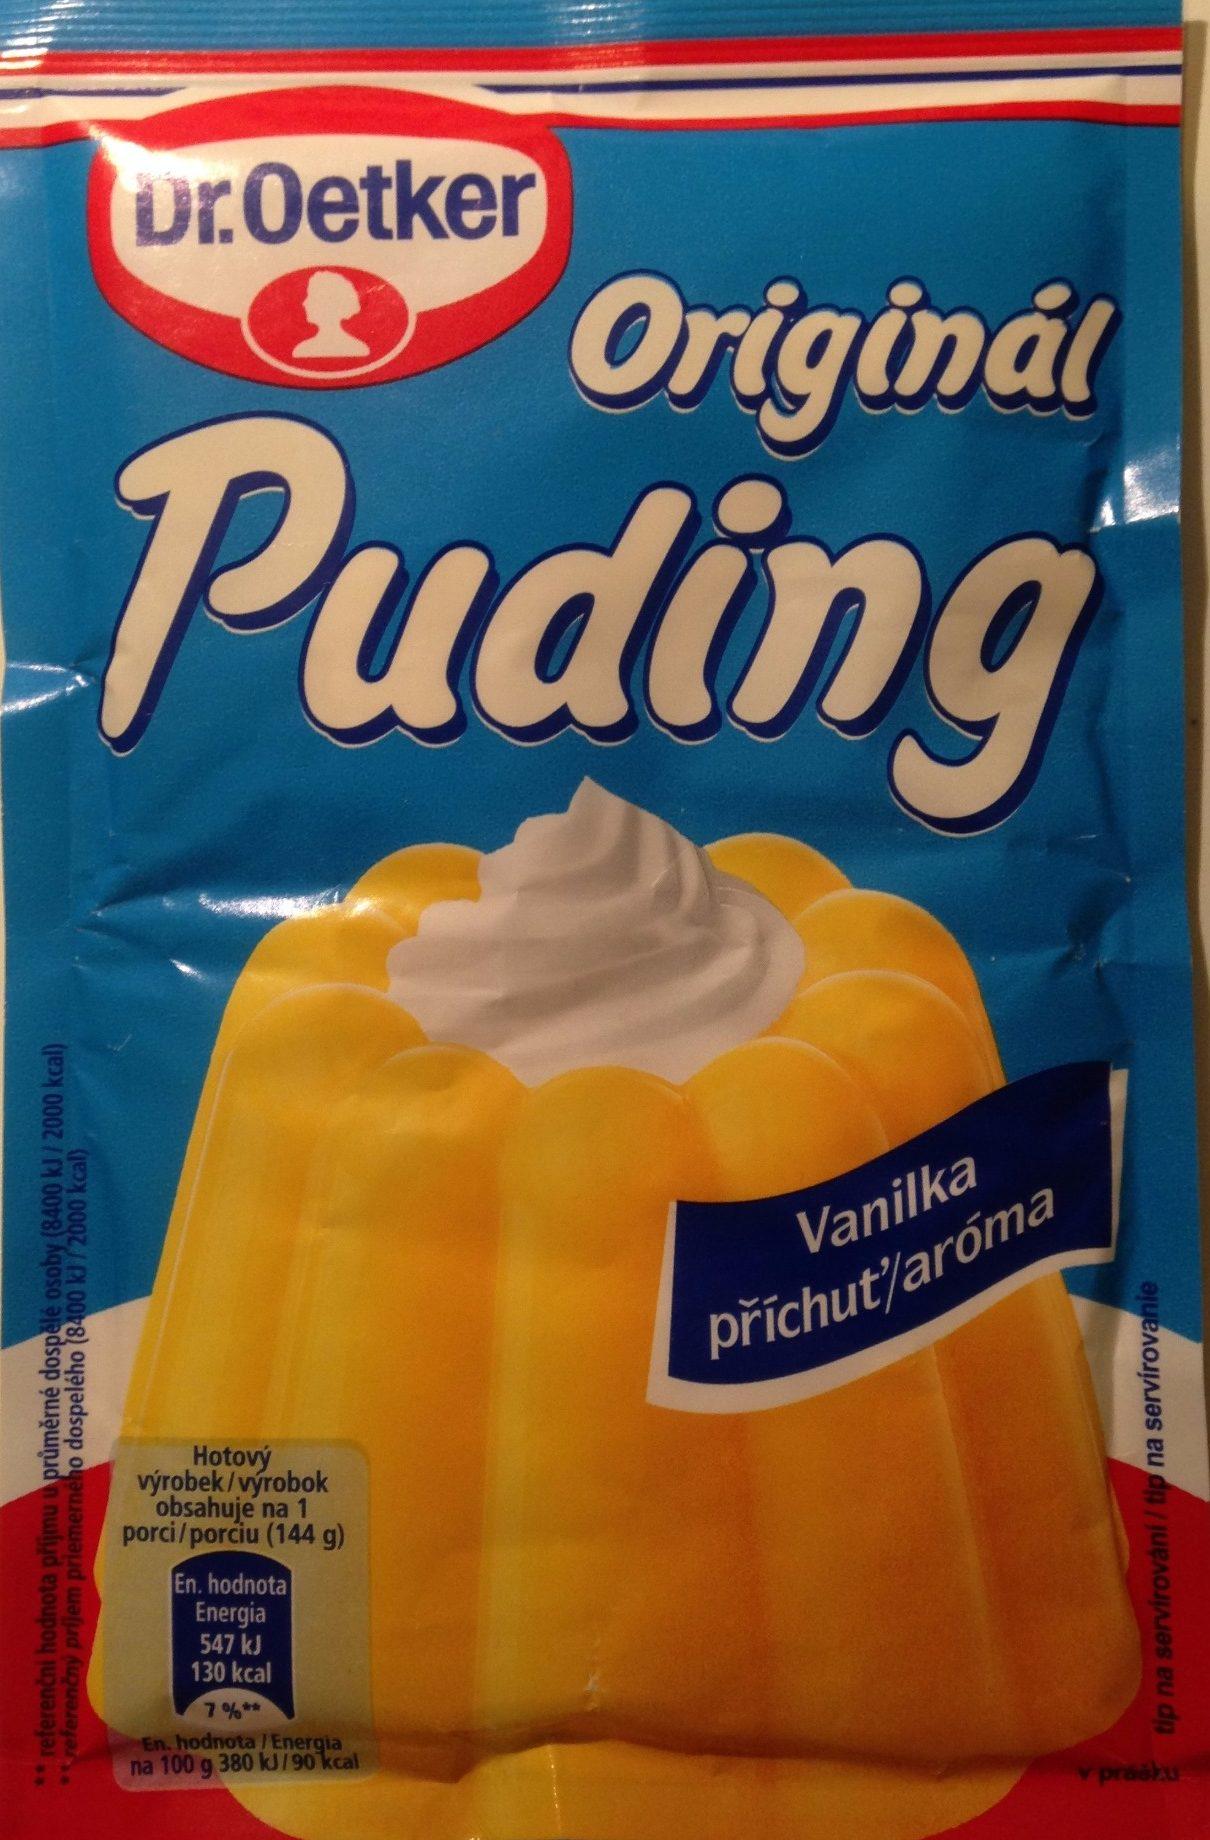 Original Puding - Product - en